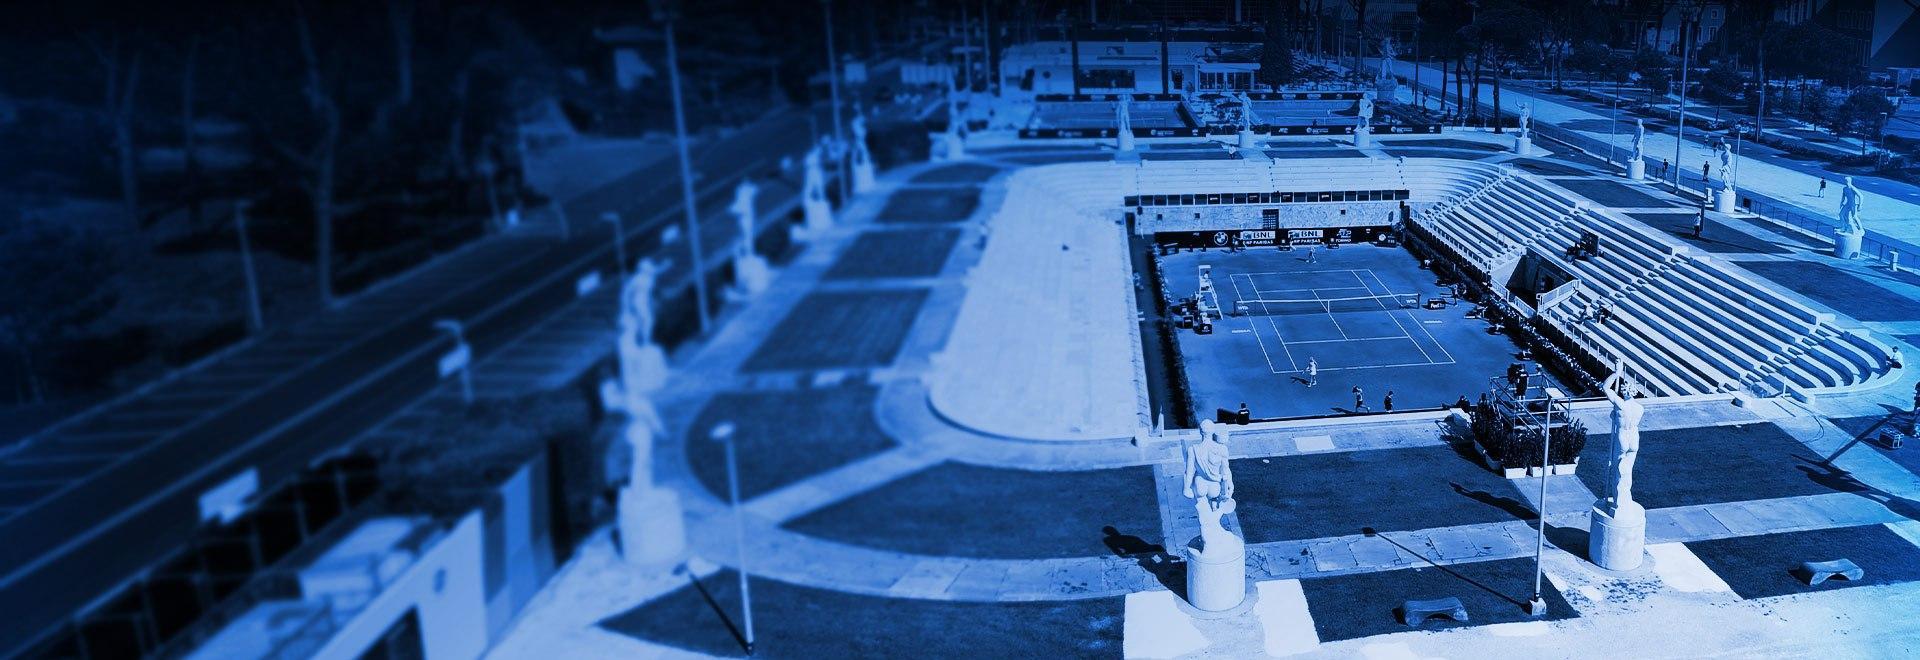 Djokovic - Tsitsipas. 3° quarto